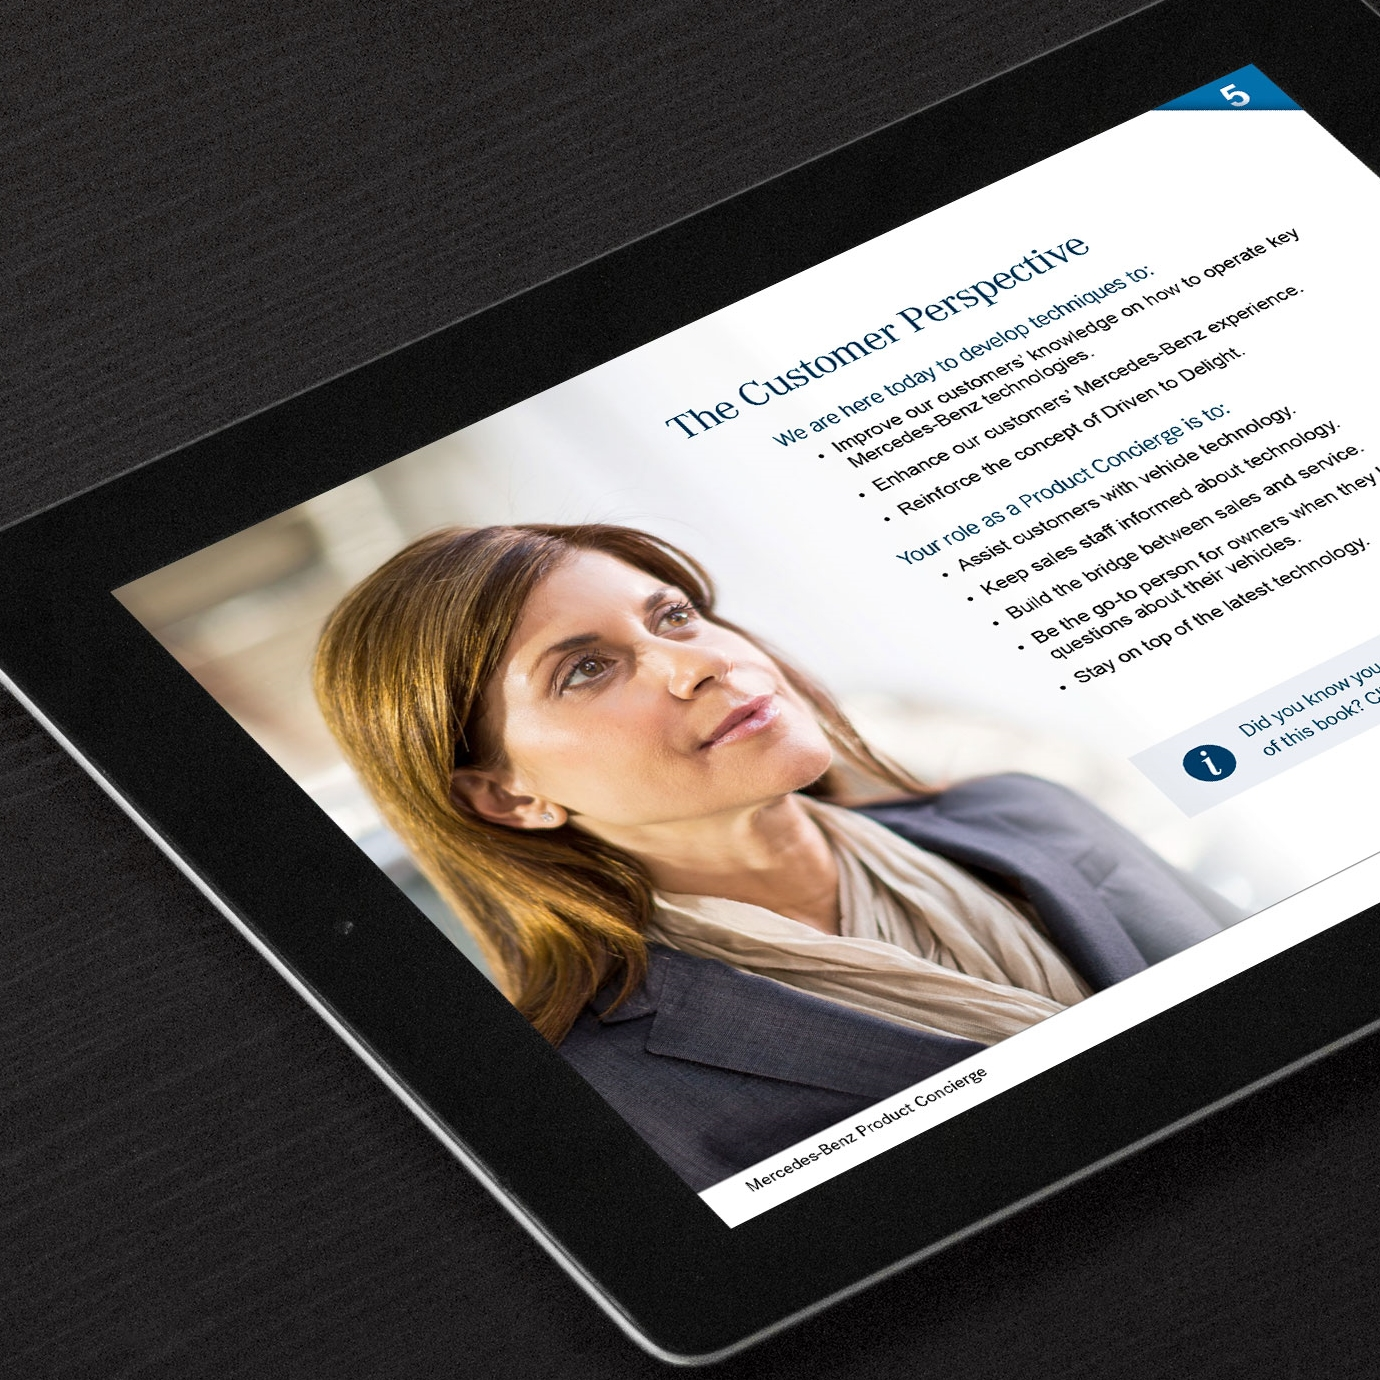 Product Concierge iBook